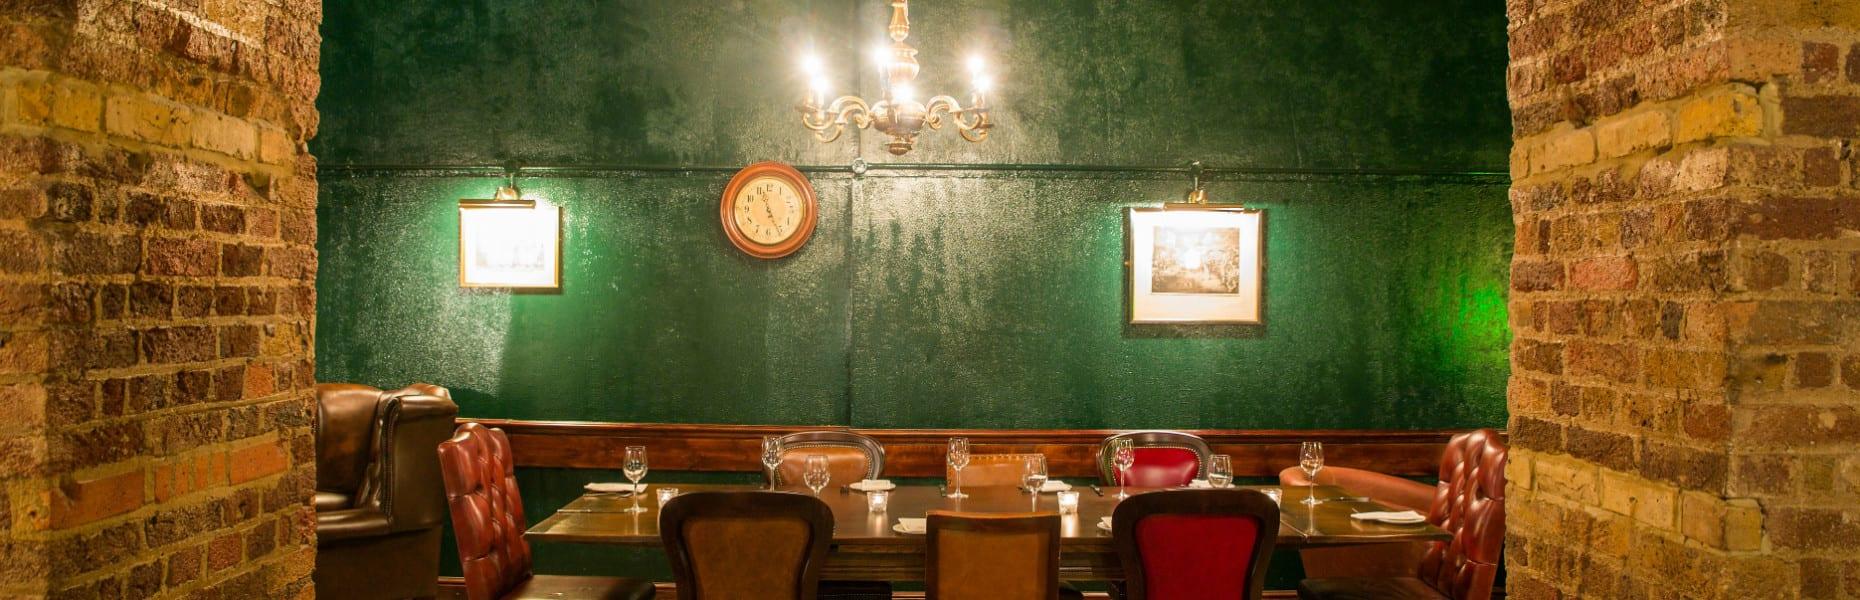 DavysCityFlogger room 1870